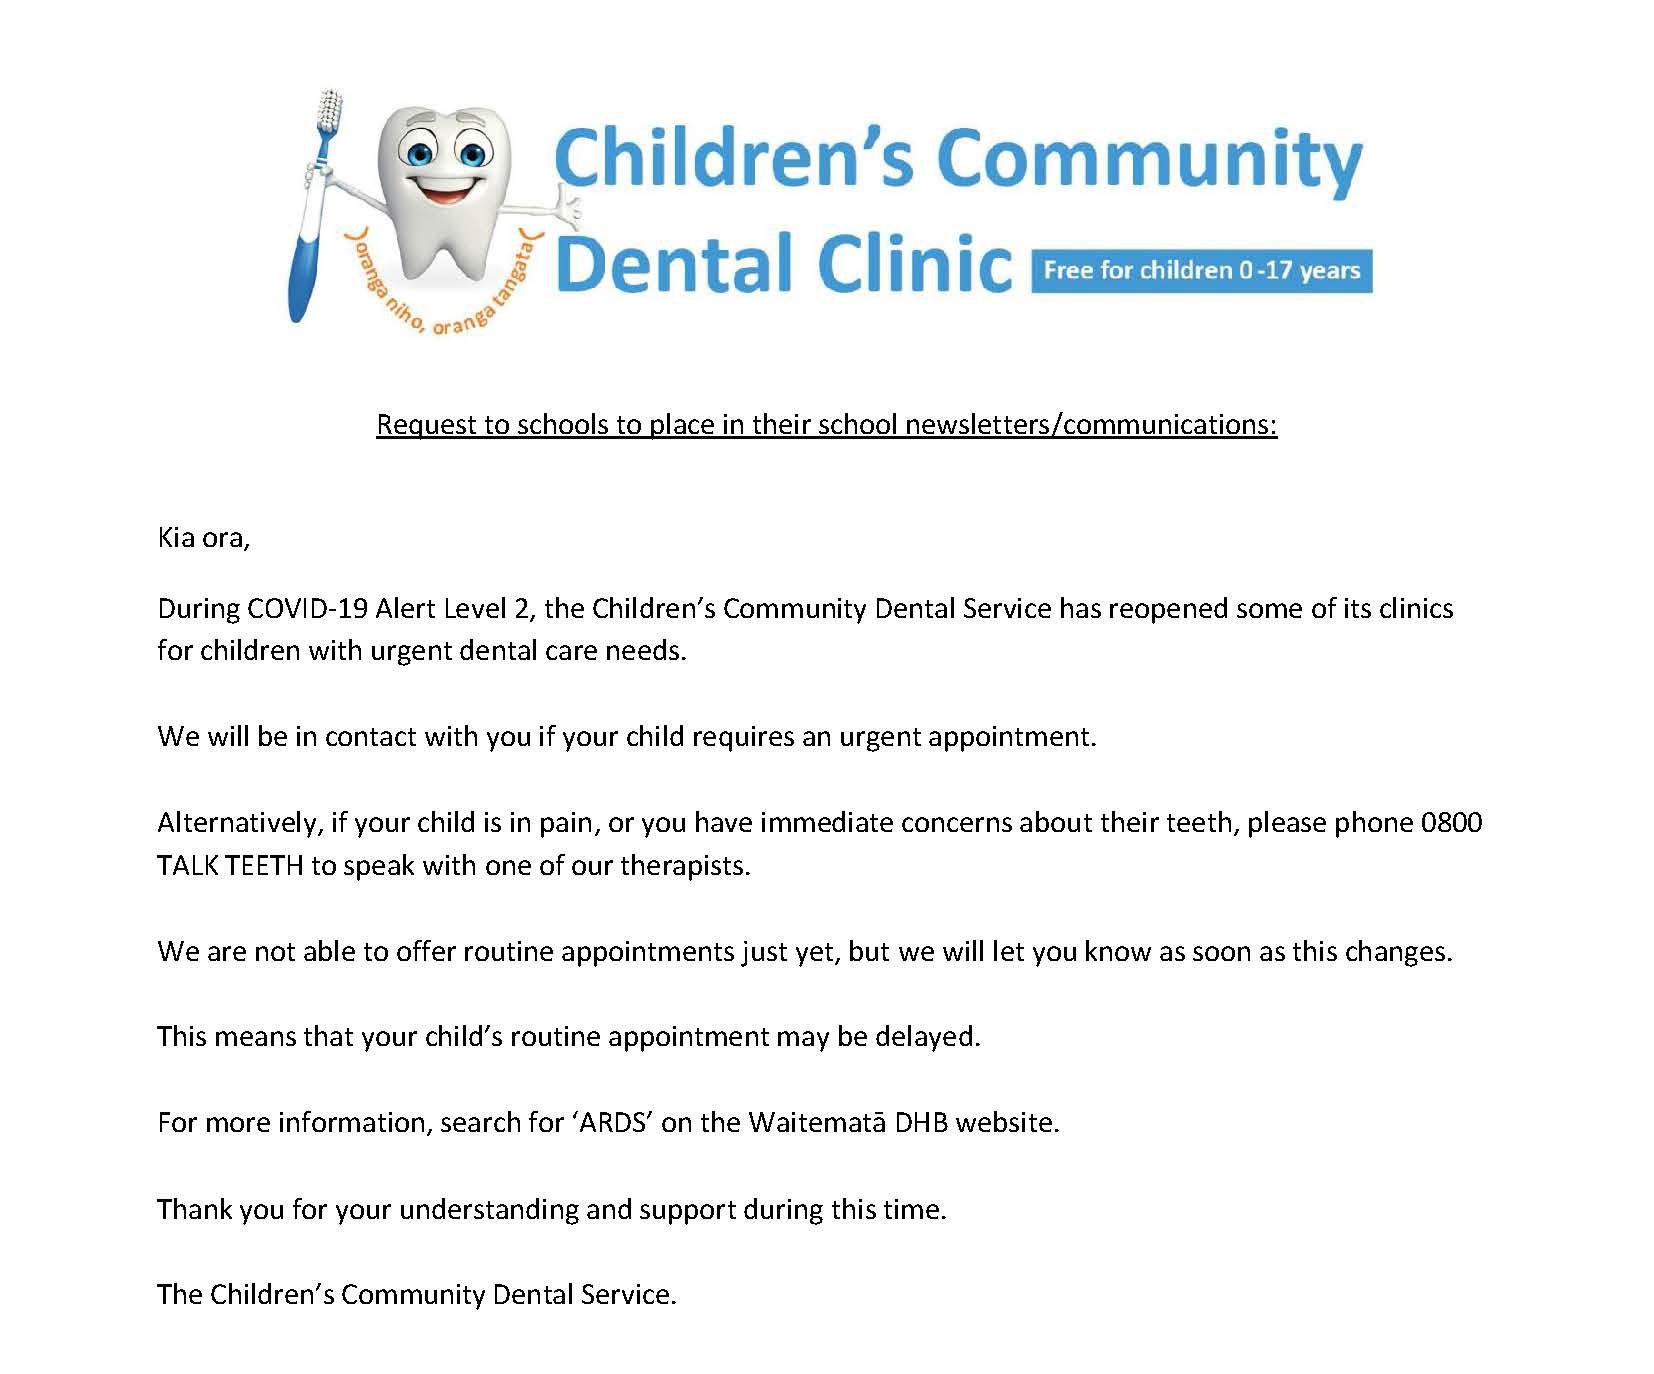 Children's Community Dental Clinic